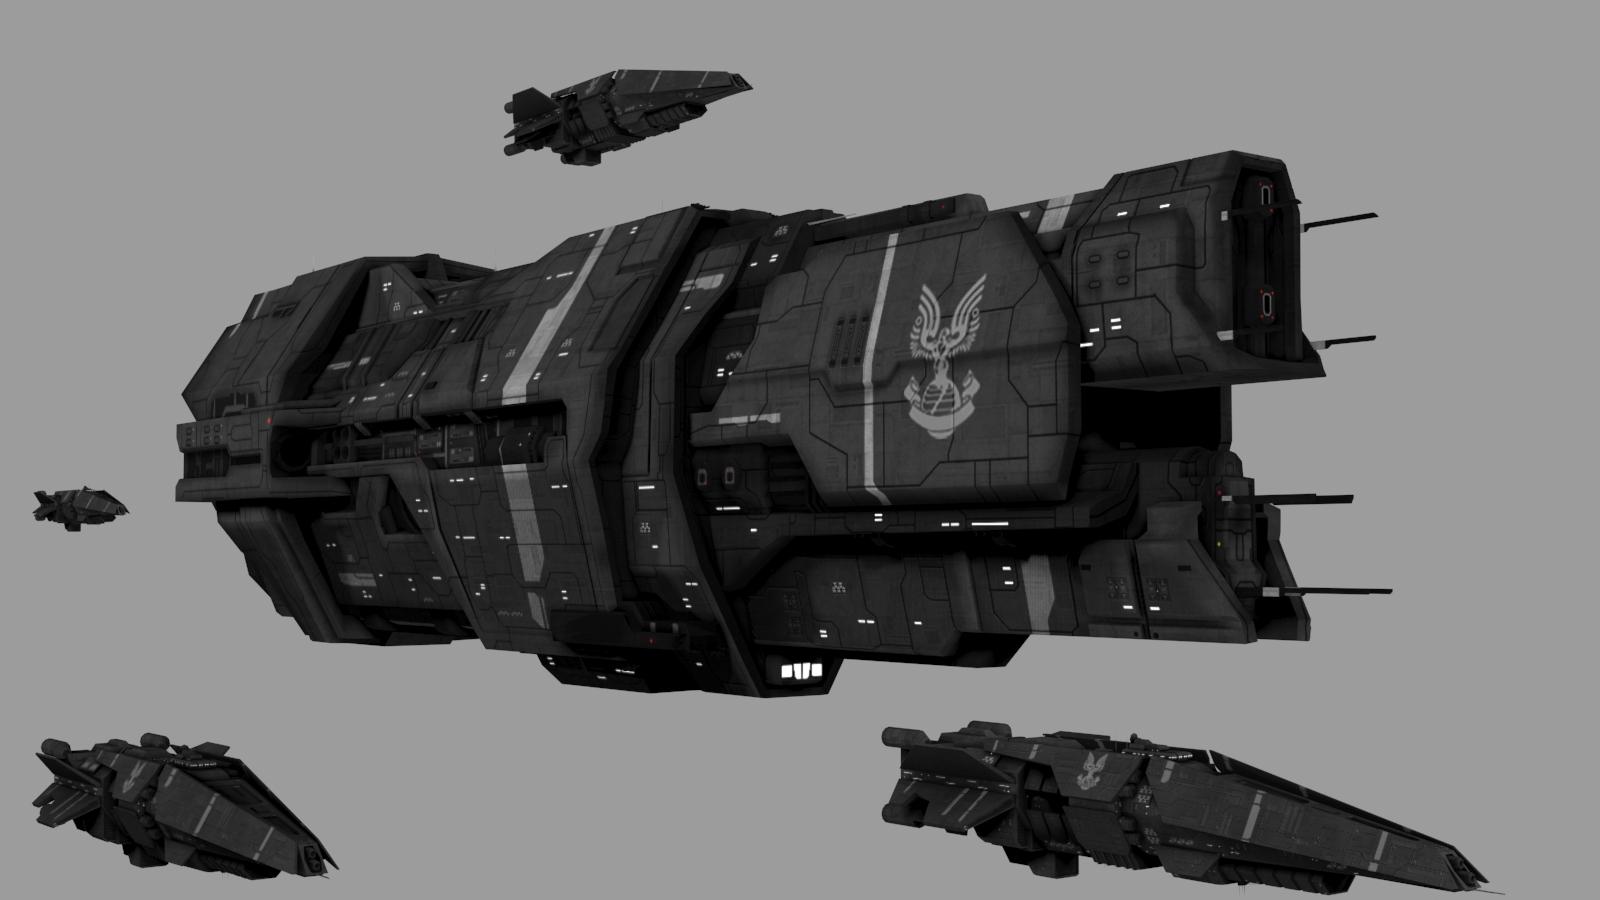 Devastator-class super-heavy cruiser